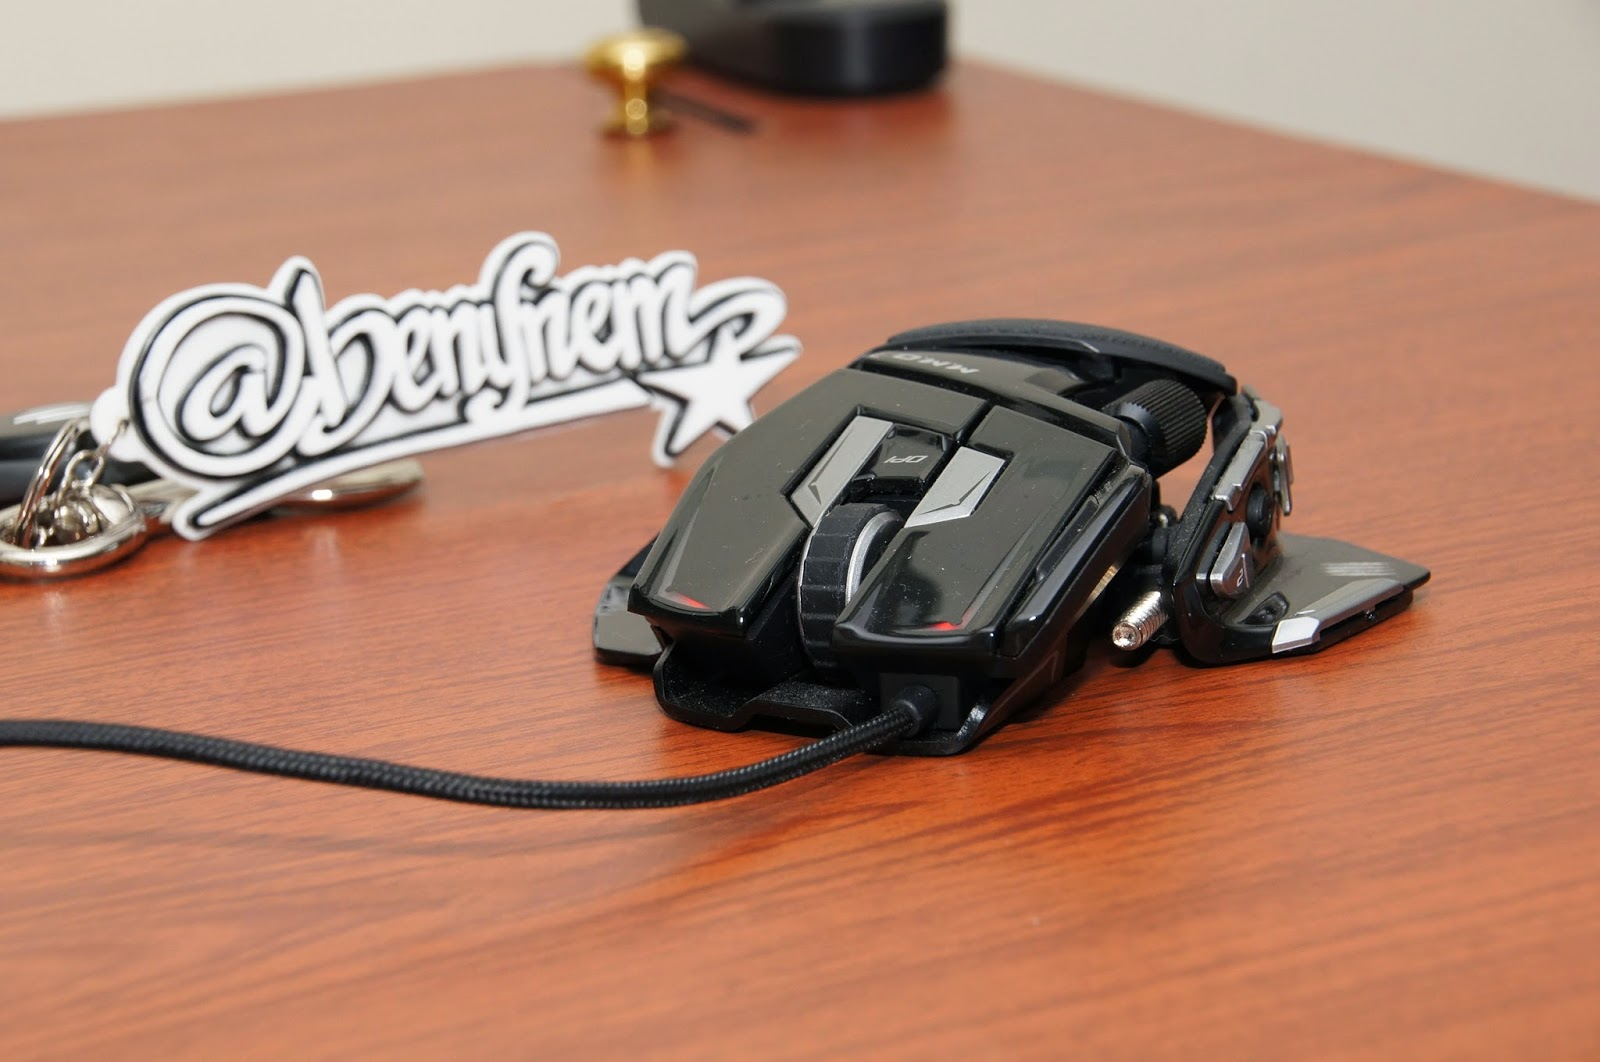 May 2015 Benklik Studio Madcatz Rat9 Wireless Gaming Mouse Putih Mad Catz Cyborg Mmo 7 Hingga 90 Action